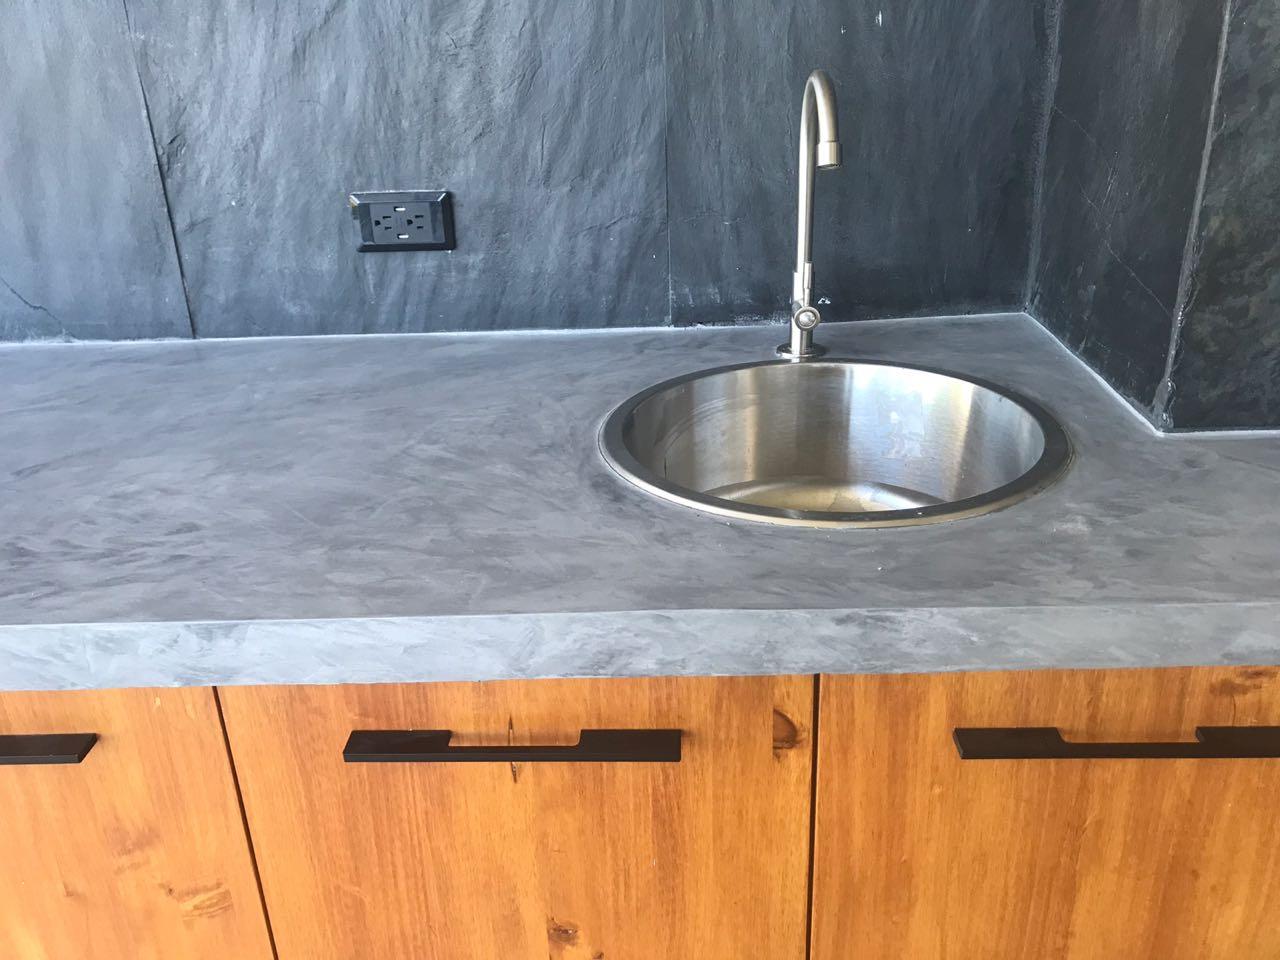 proyecto residencial_mueble de cocina4